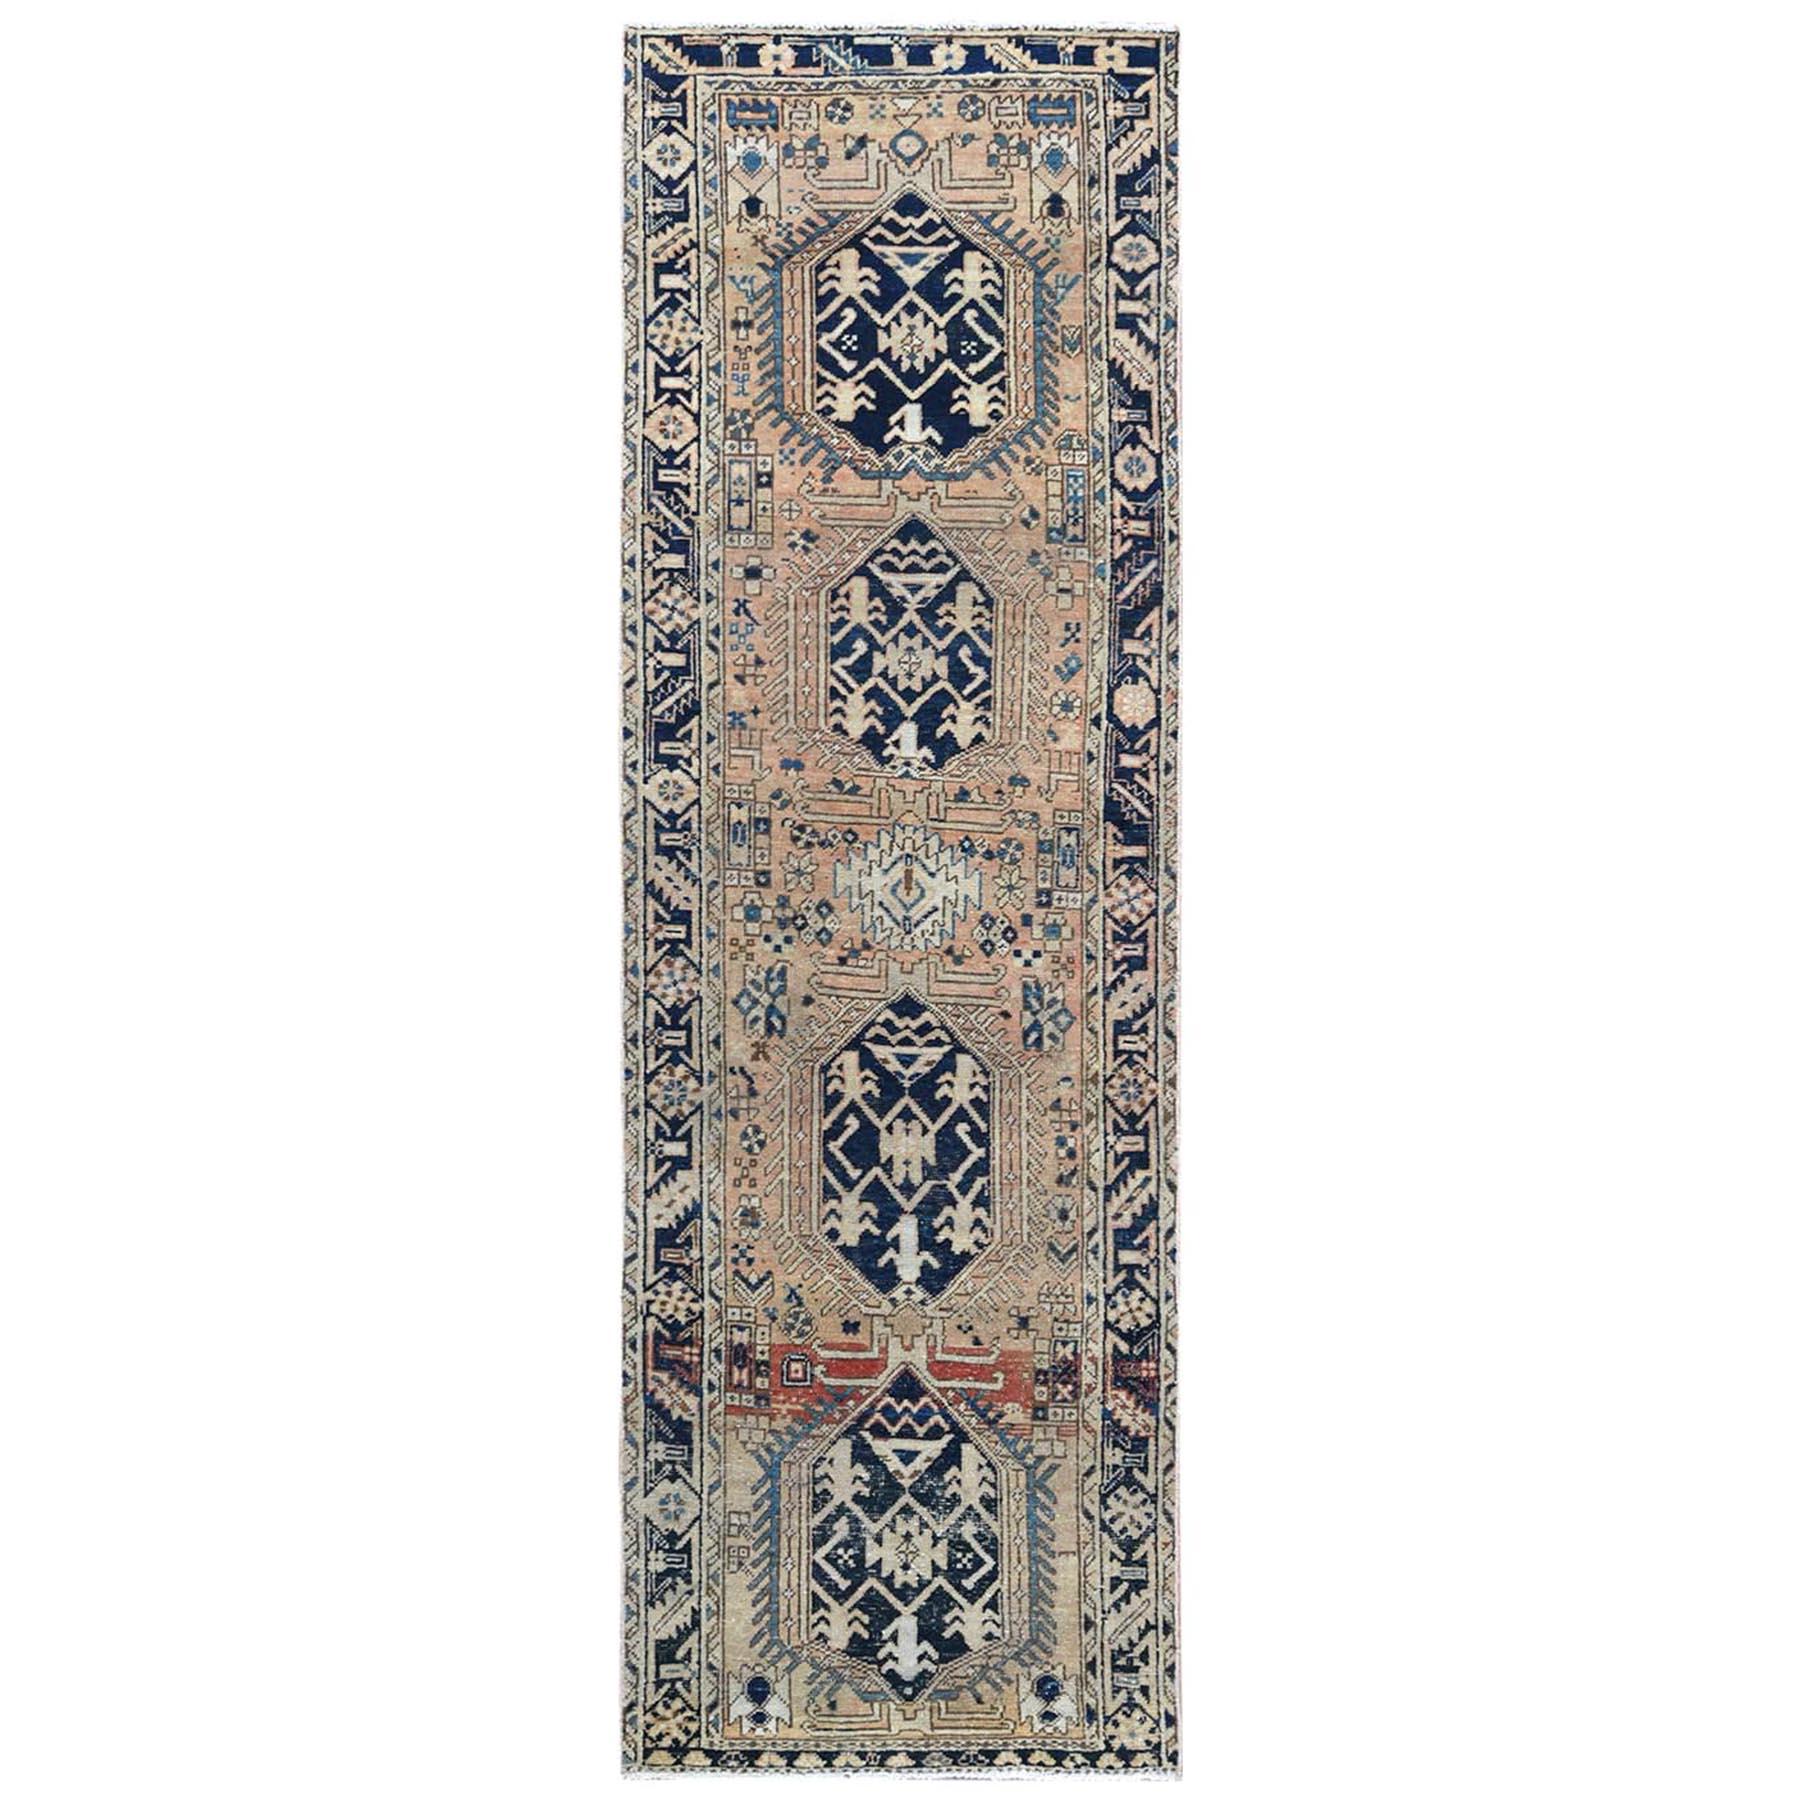 Details about  /Scandinavian Rugs Oriental Flat Weave Rug Woven Hand Wool//Jute Round Antique Rag